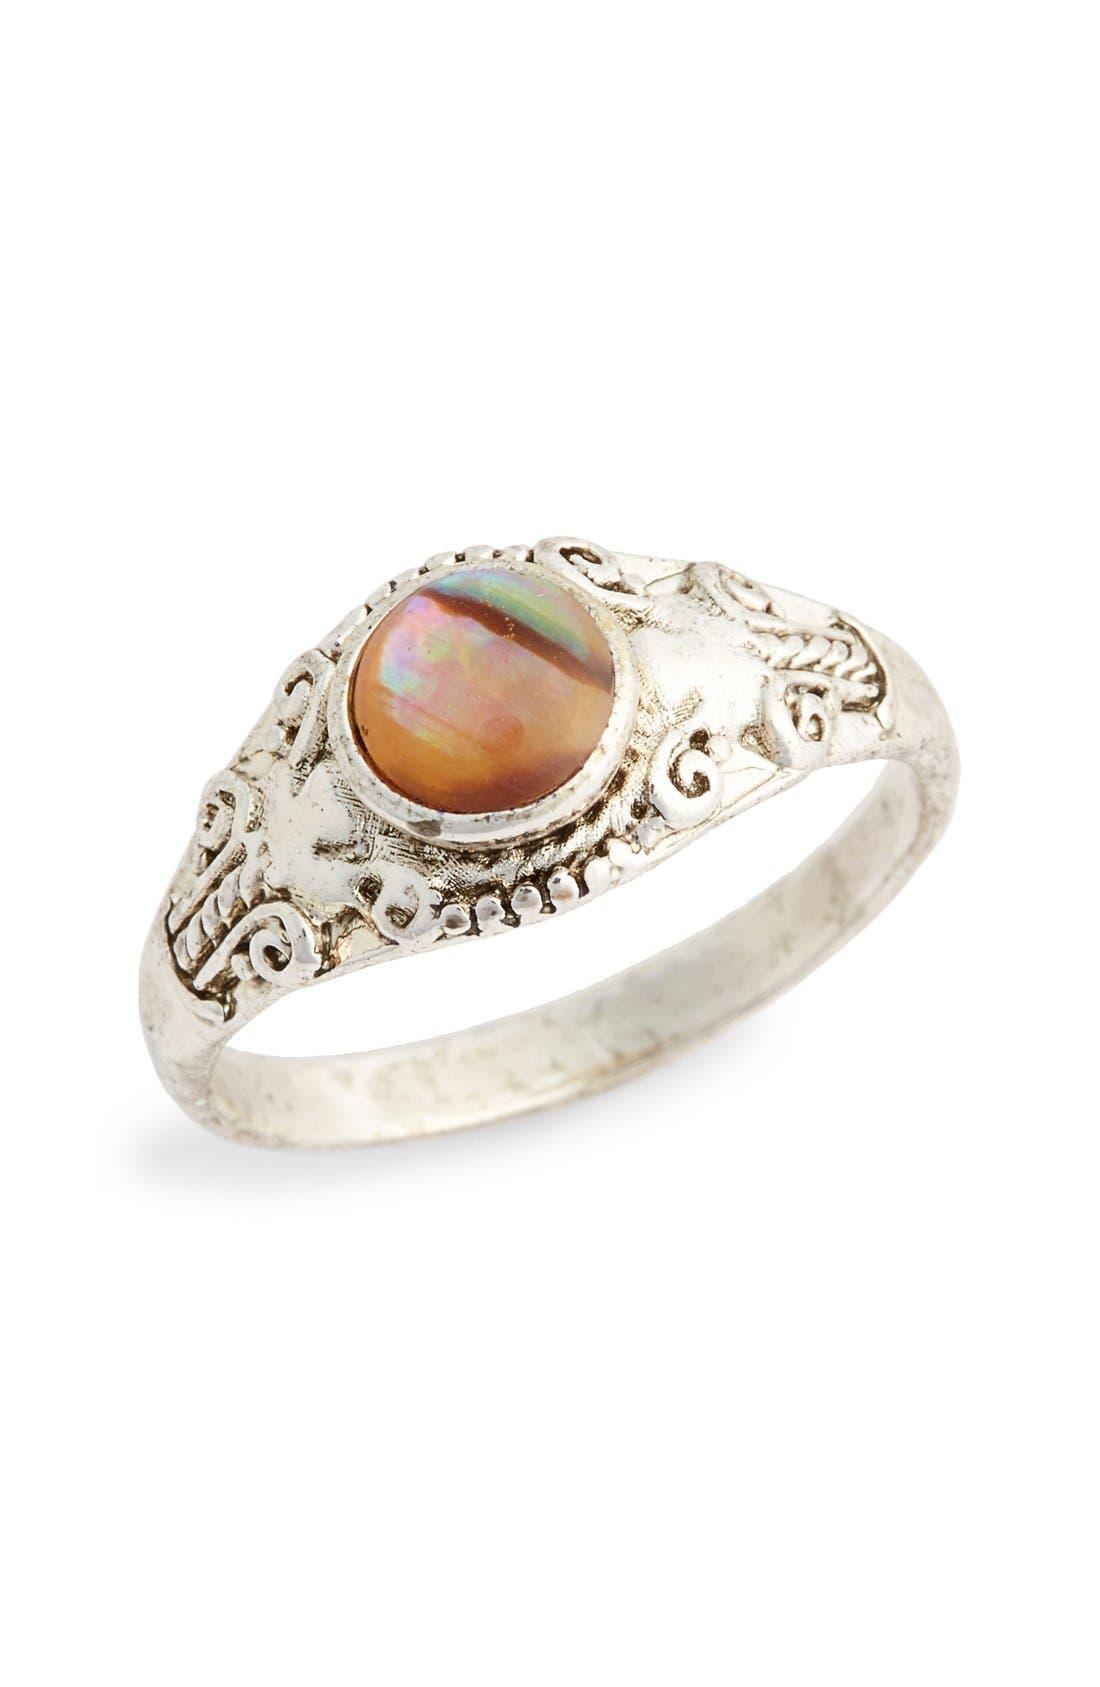 Main Image - Topshop 'Mystic' Stone Ring